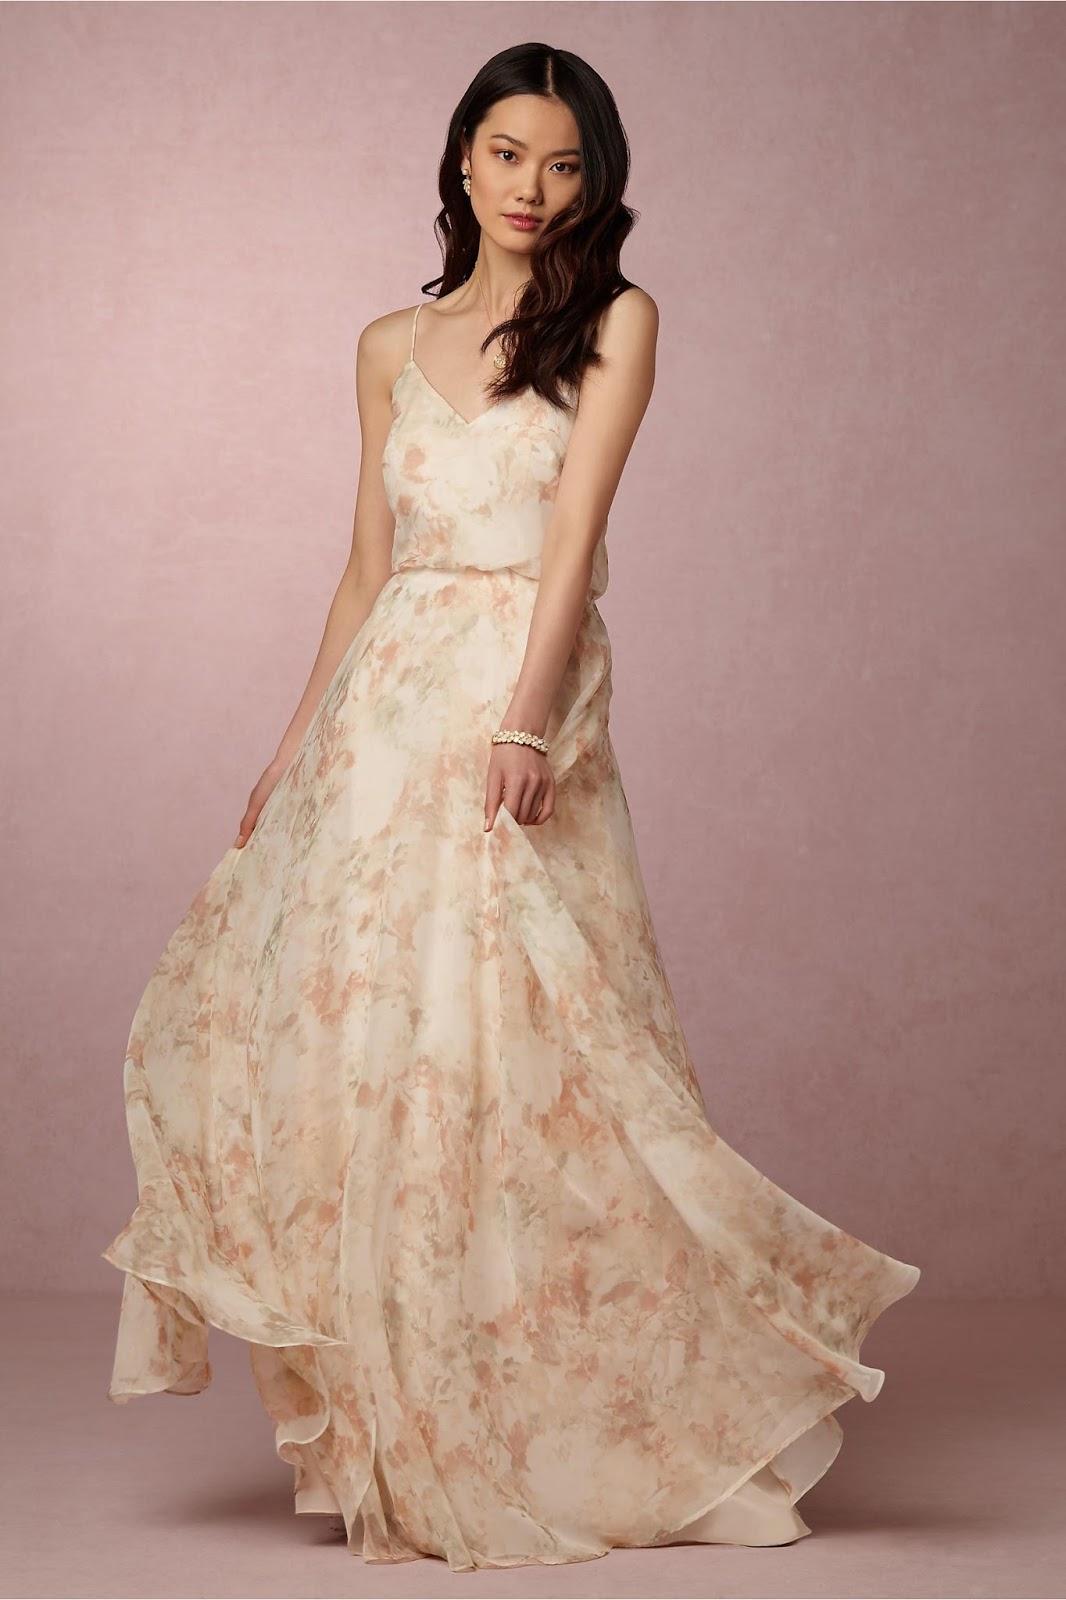 Vestidos de fiesta para matrimonio civil